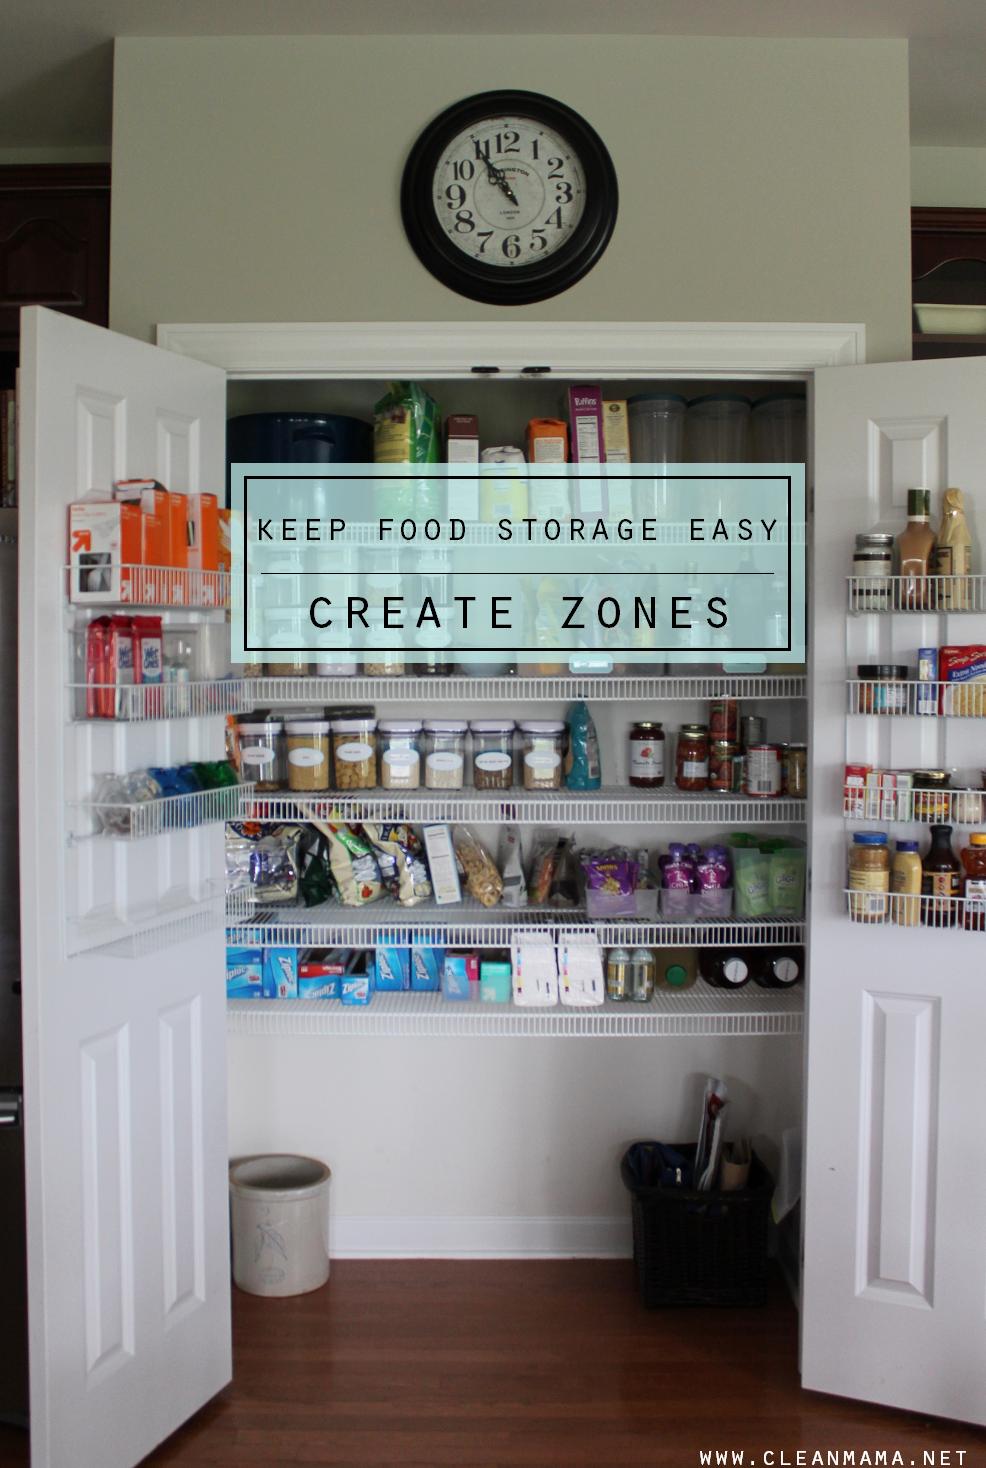 Keep Food Storage Easy - Create Zones - Clean Mama